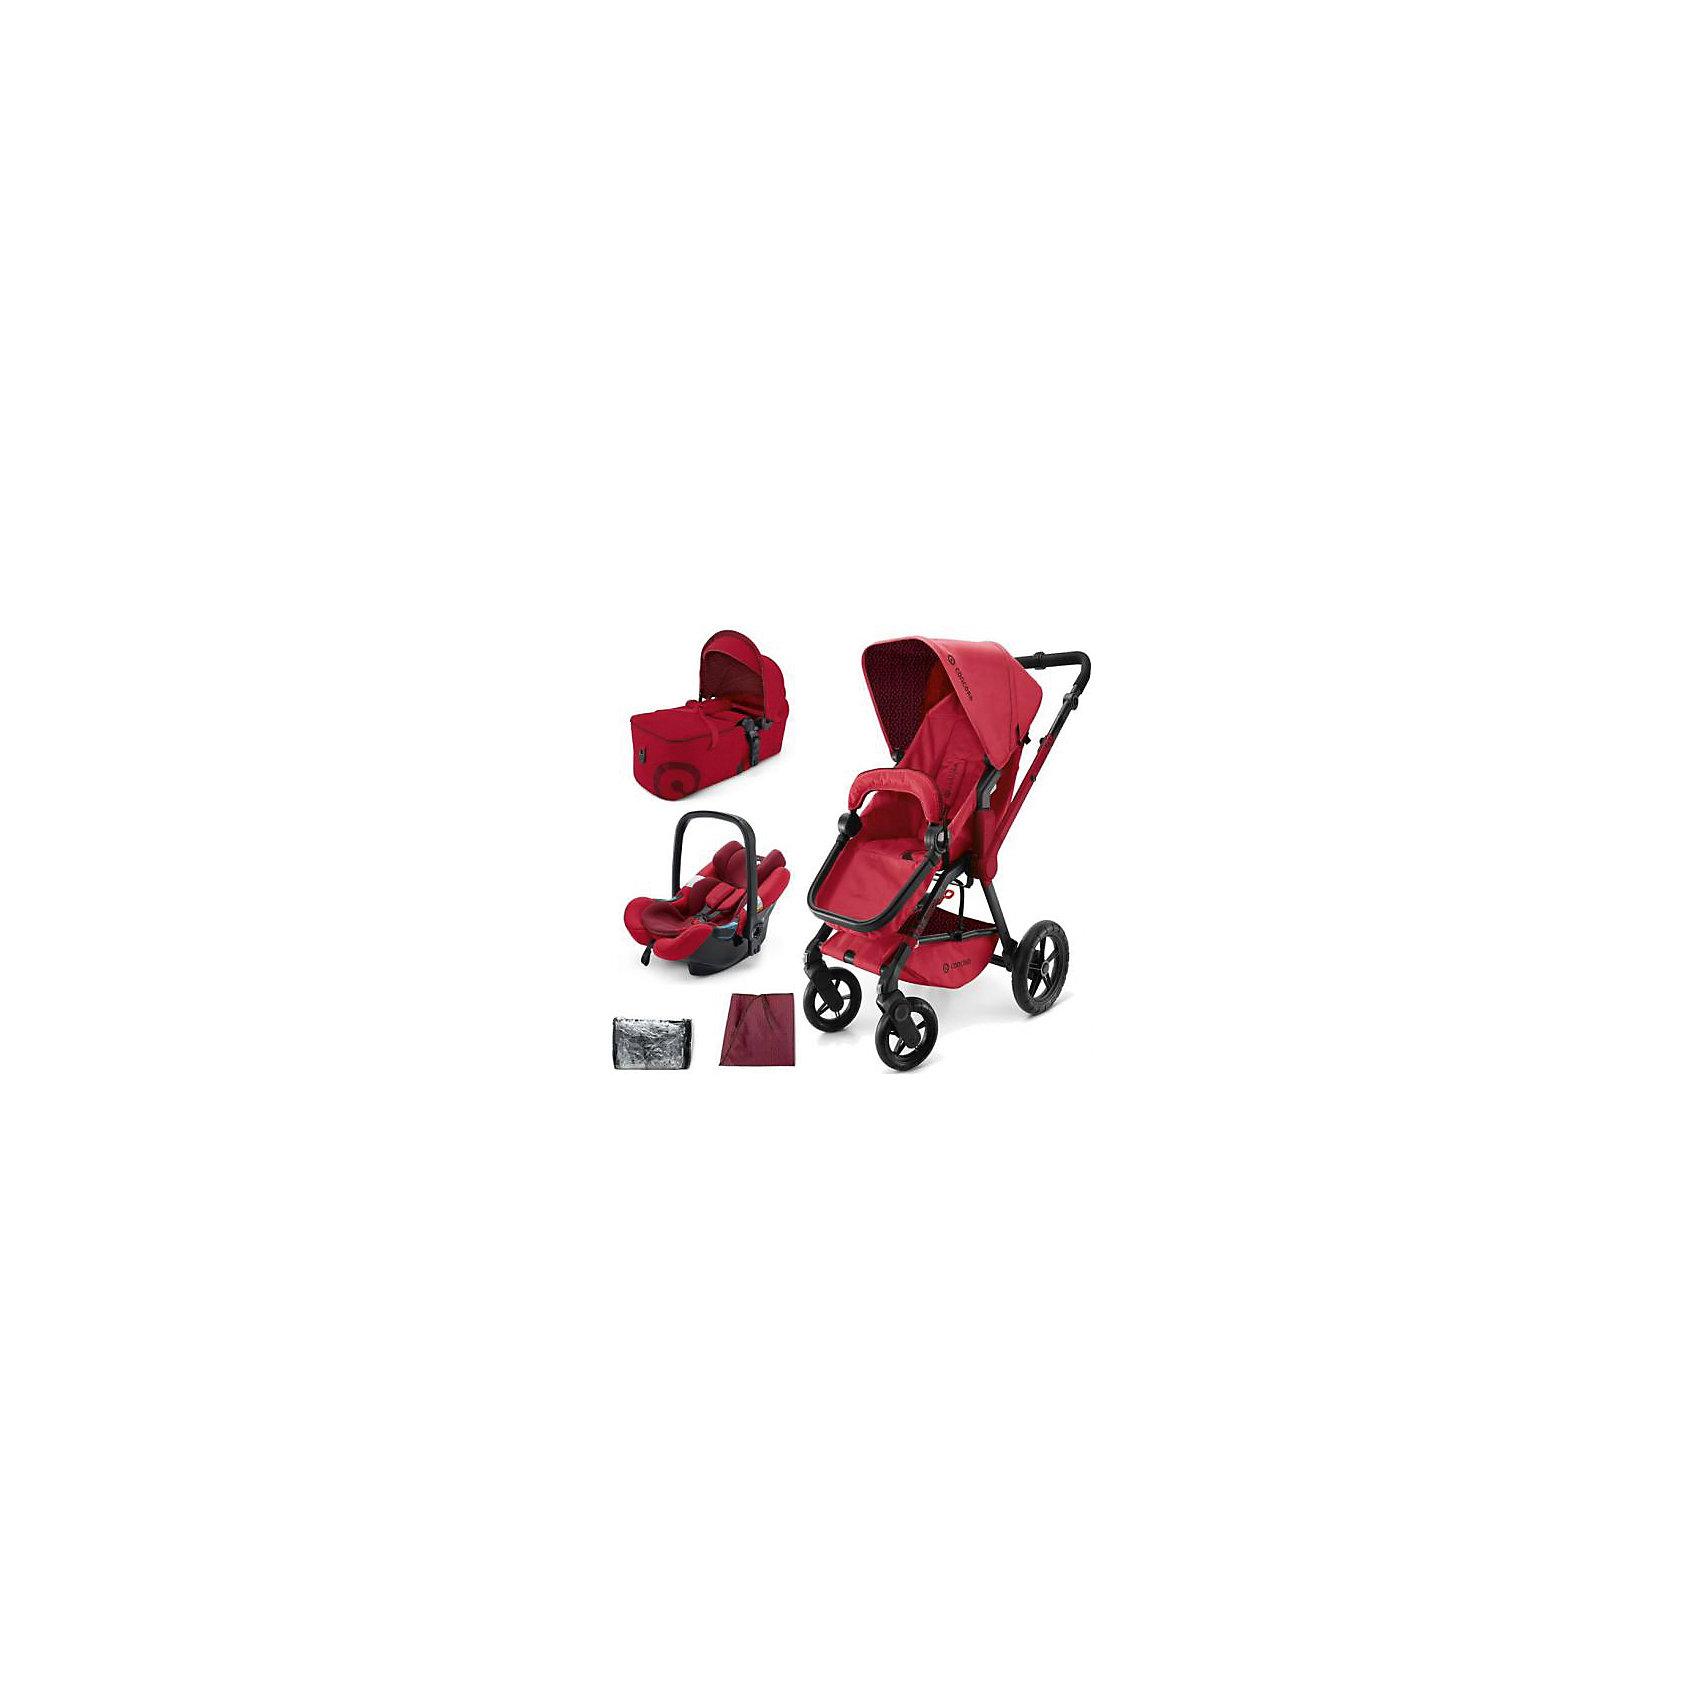 Concord Коляска 3 в 1 Wanderer Mobility Set, Concord, Ruby Red 2015 все цены